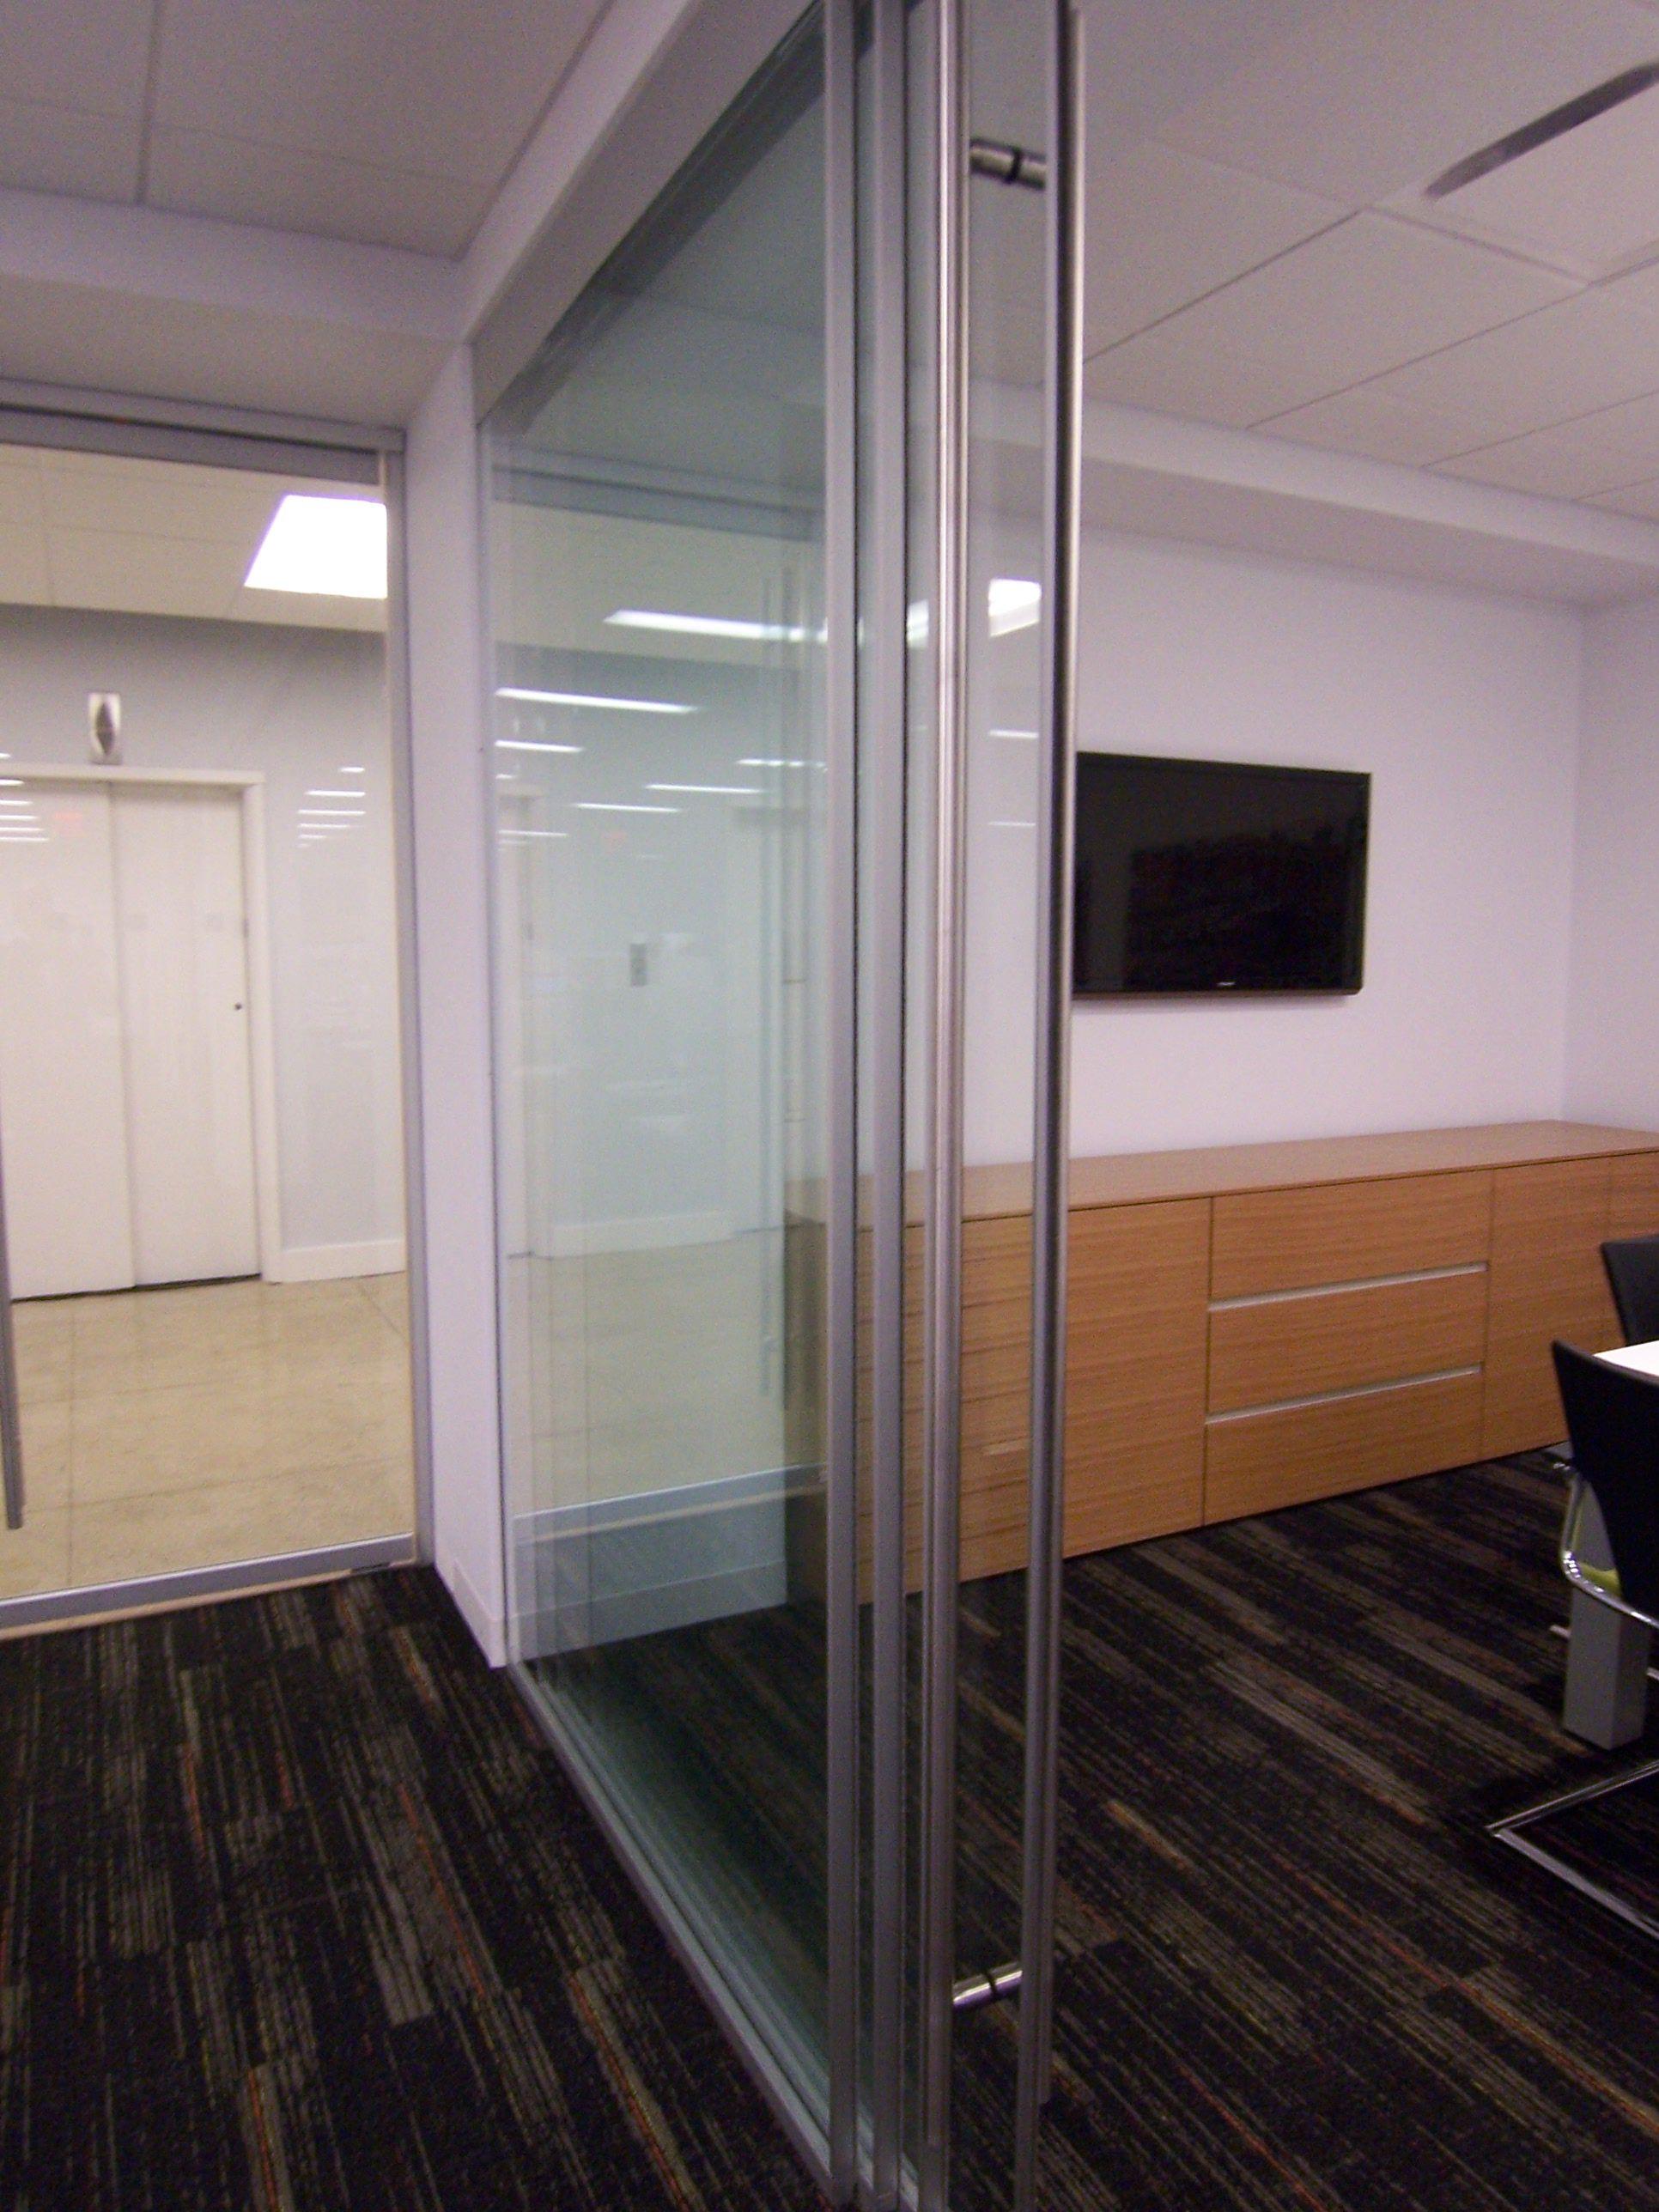 Game Room Sliding Glass Room Dividers Inspirational Gallery: Muraflex Telescoping Modular Wall